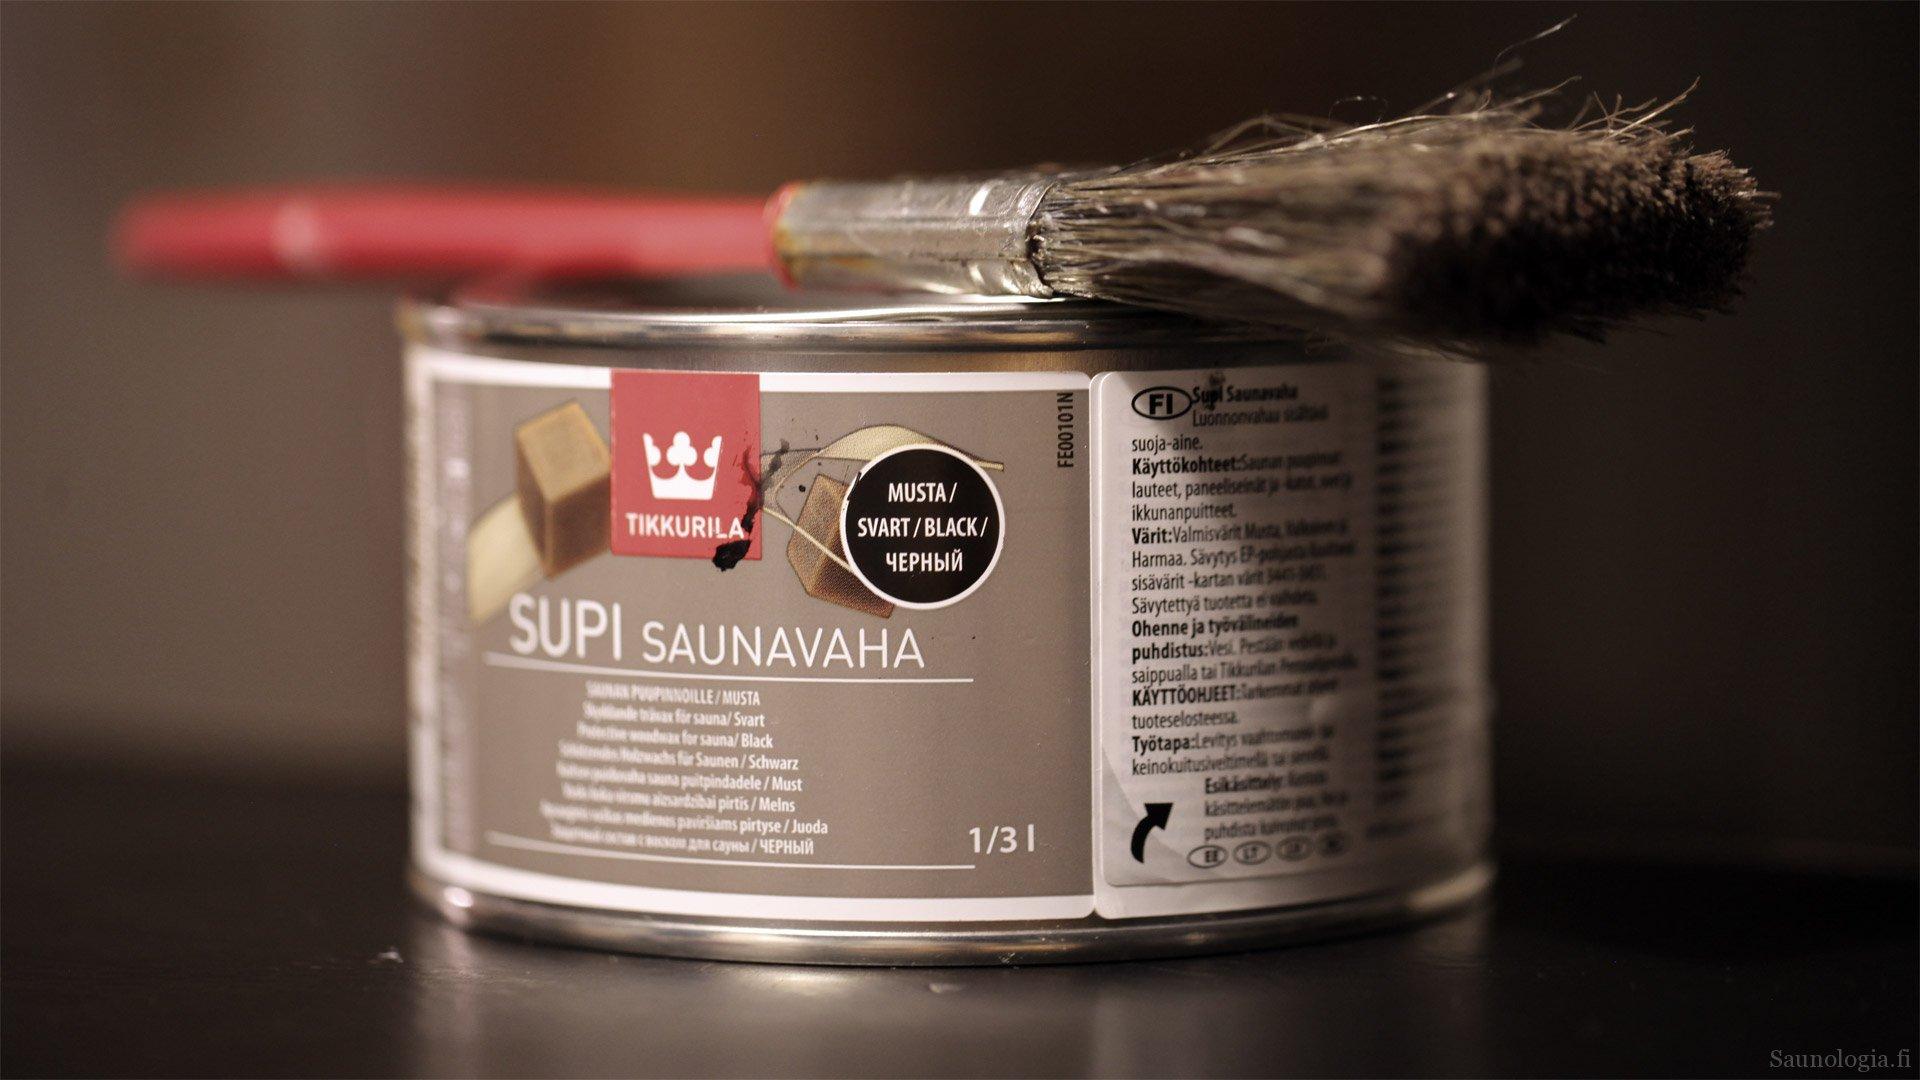 Saunavaha